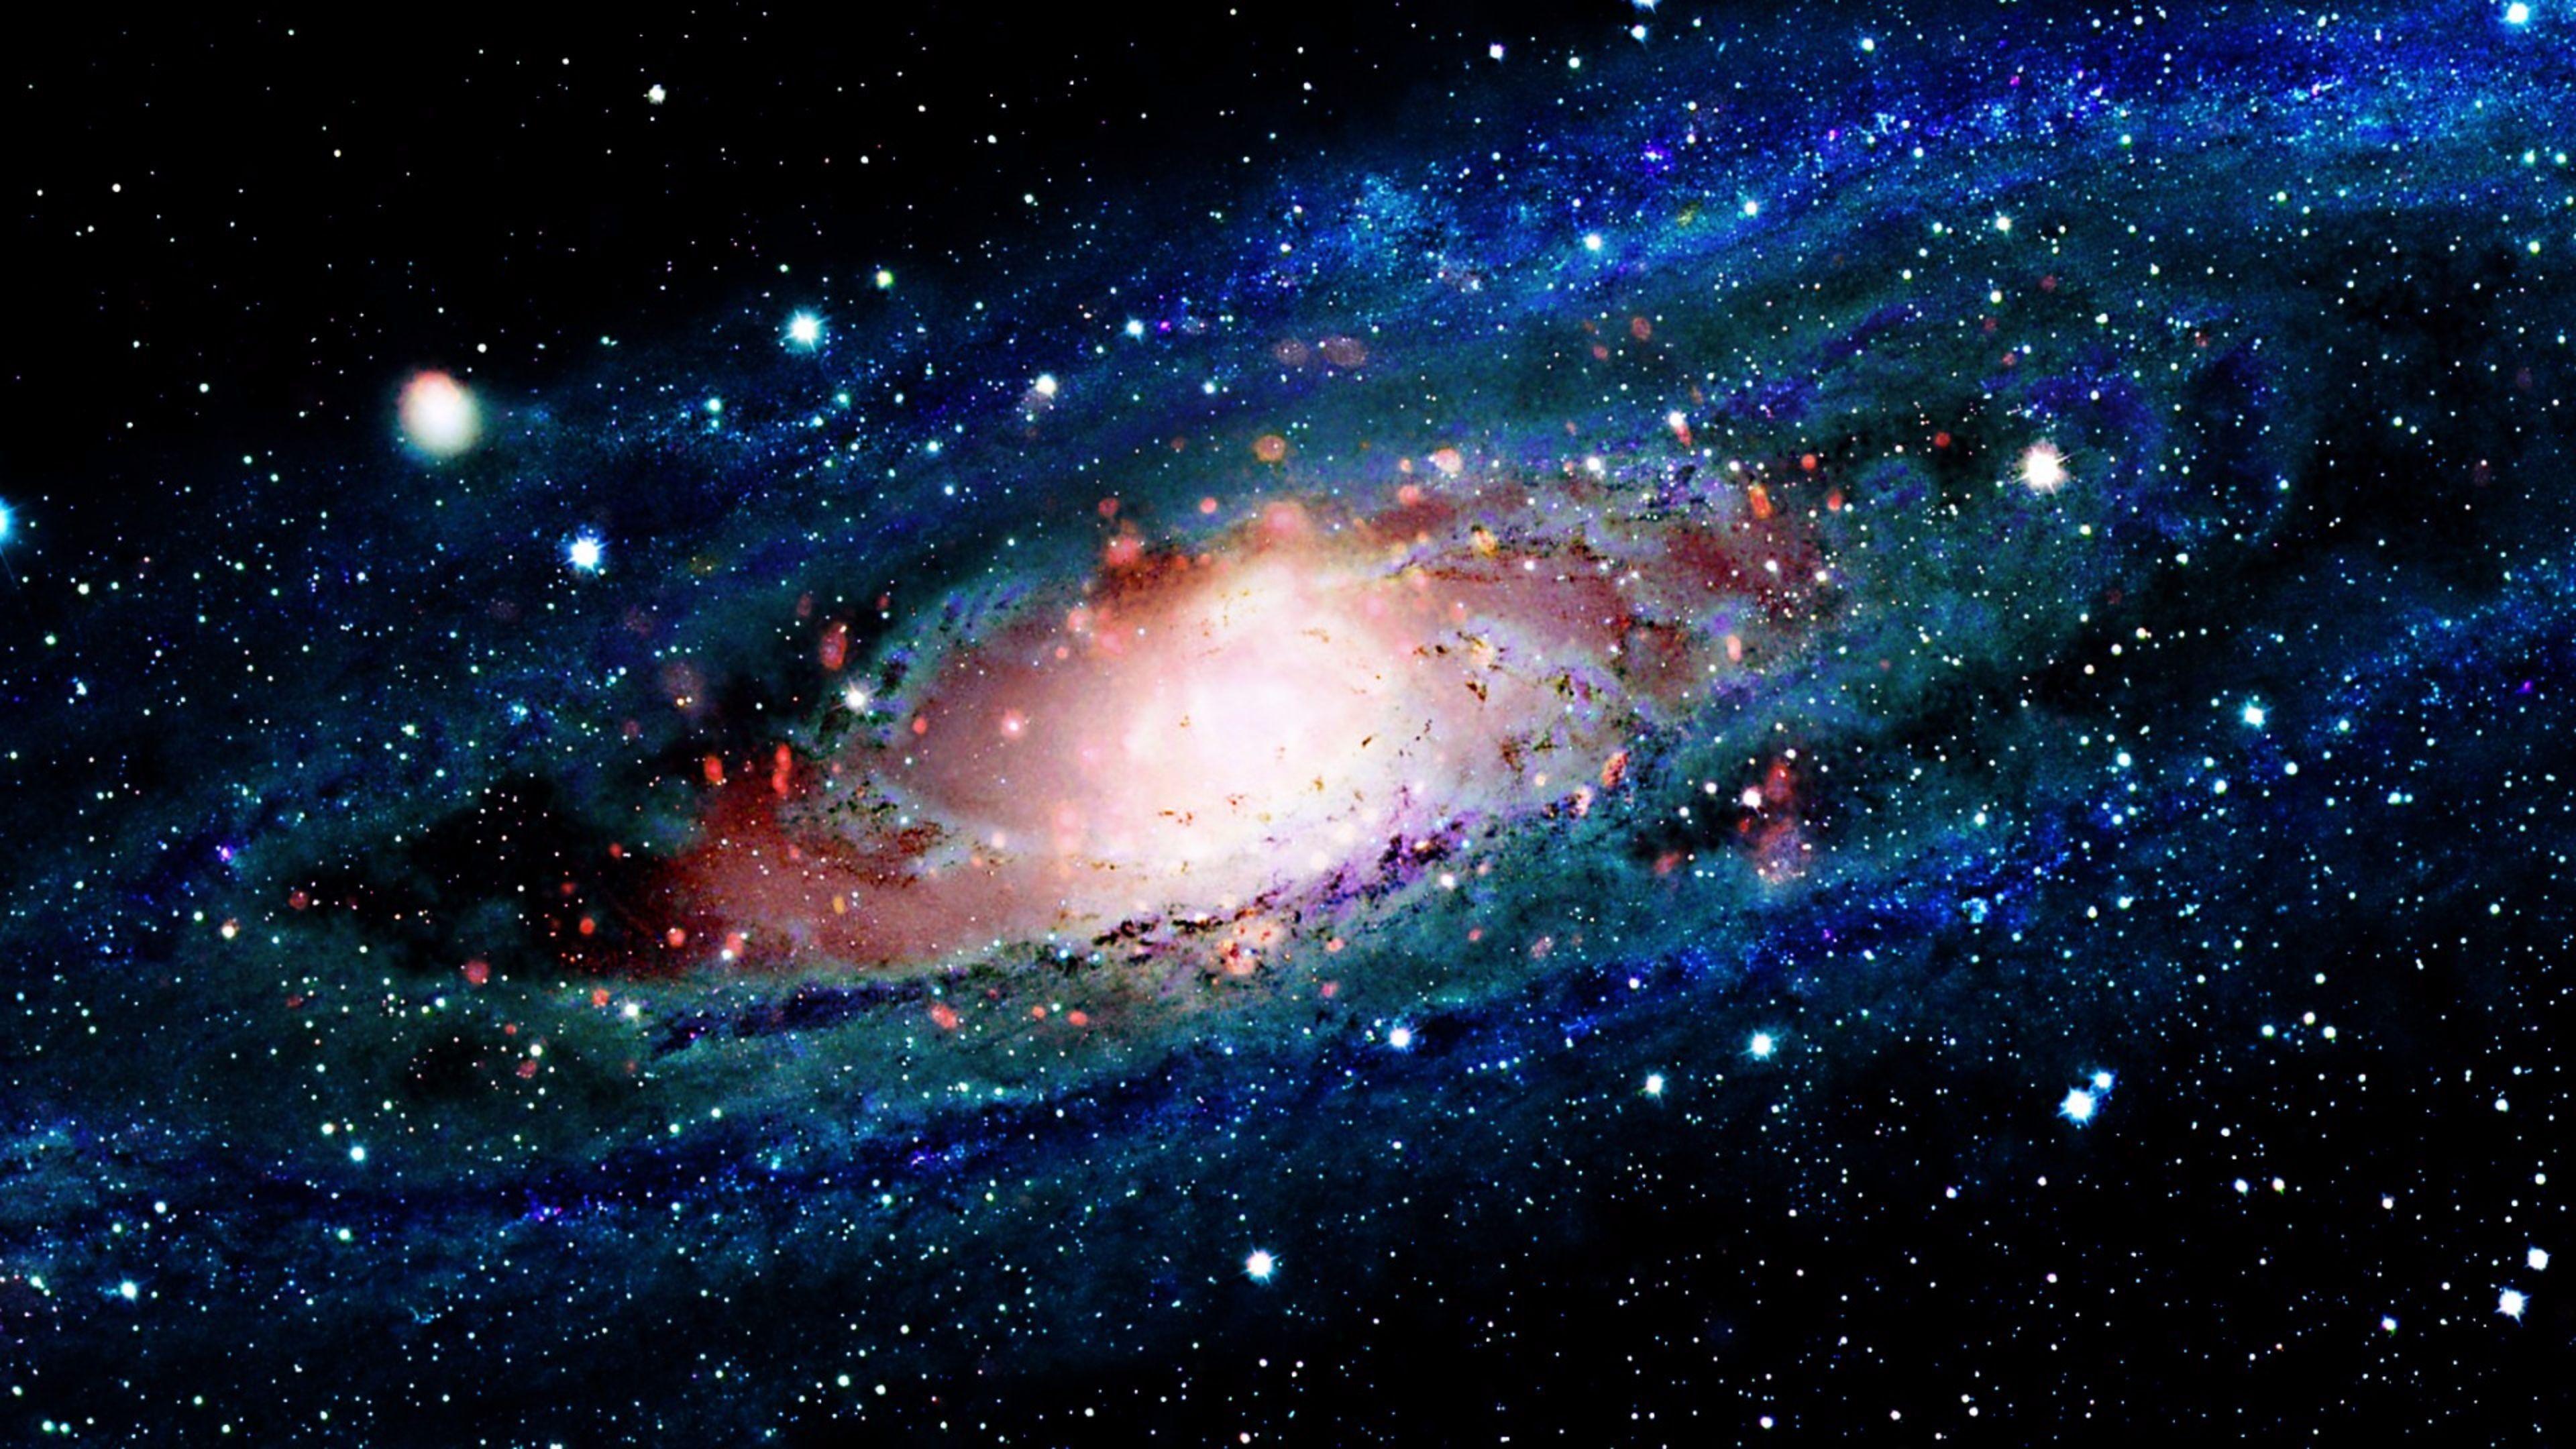 Res 3840x2160, 4K Space Wallpaper 7 Andromeda galaxy